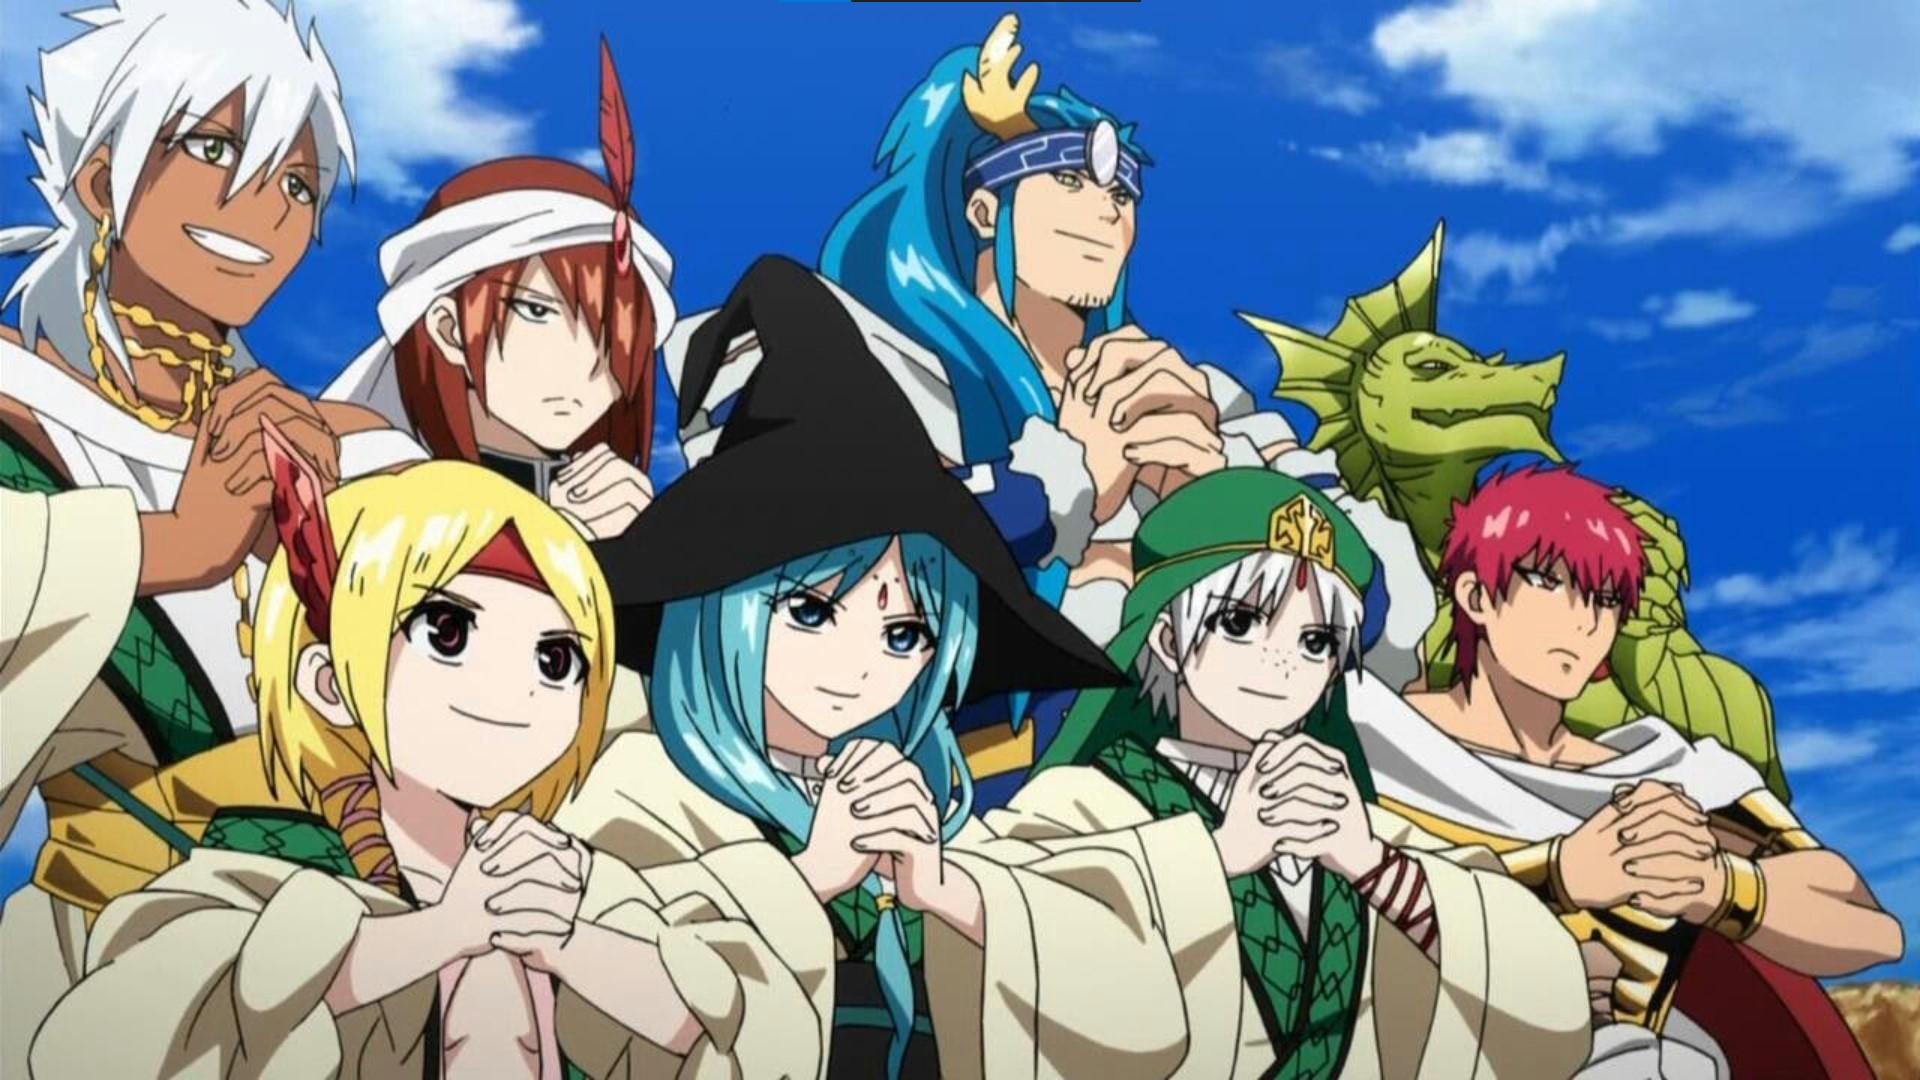 Adventure of Sindbad - magi anime watch order